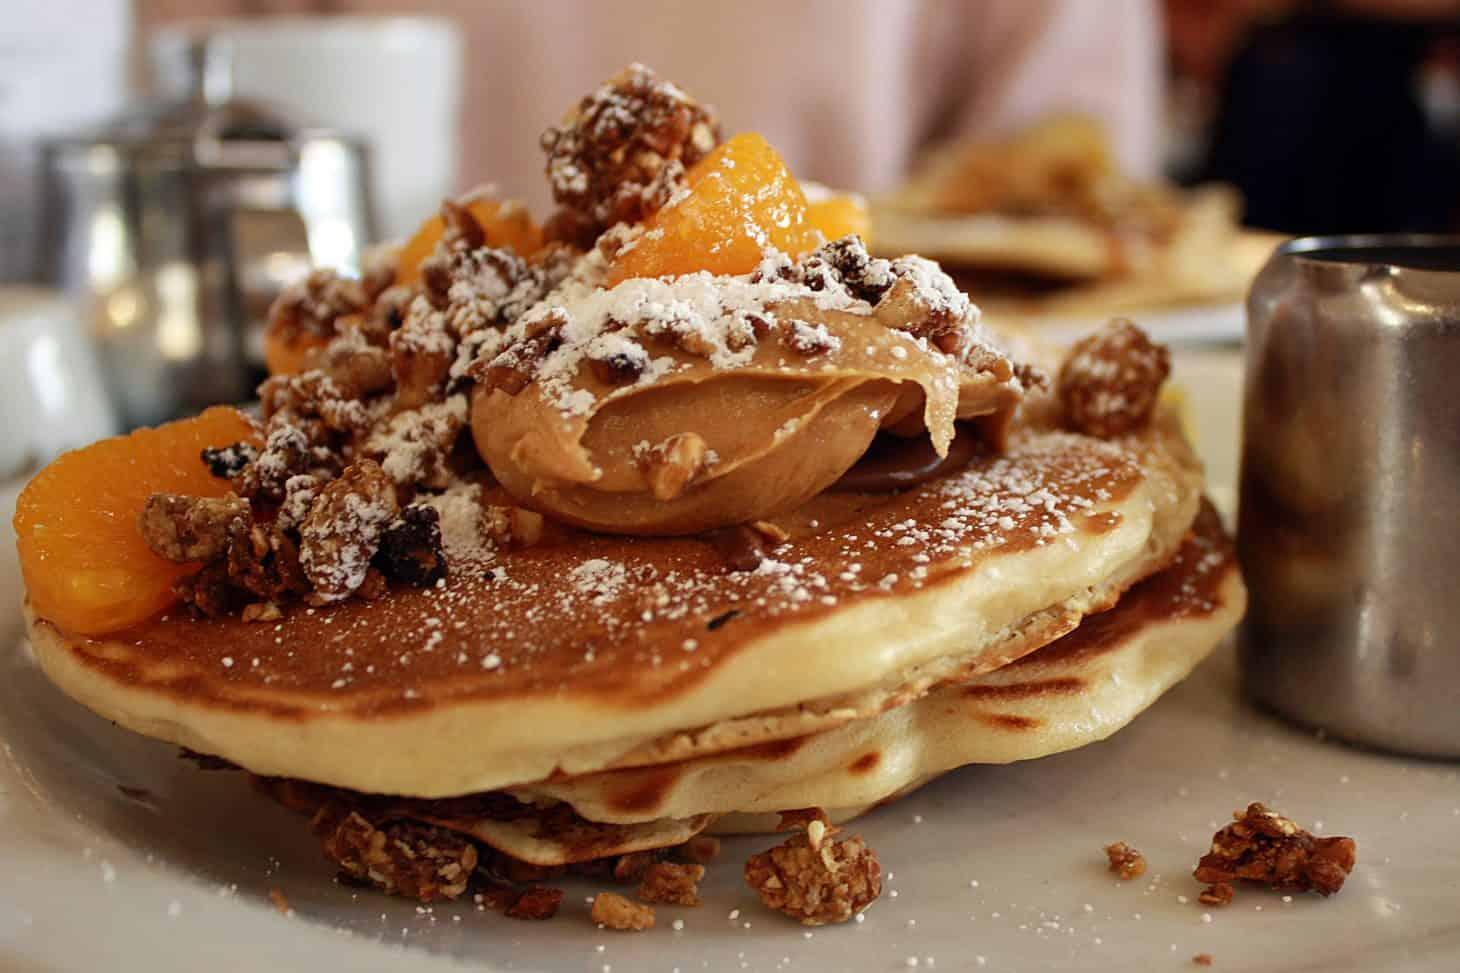 Moose-Coffee-Granola-Chocolate-Peanut-Butter-Pancakes-1460x973